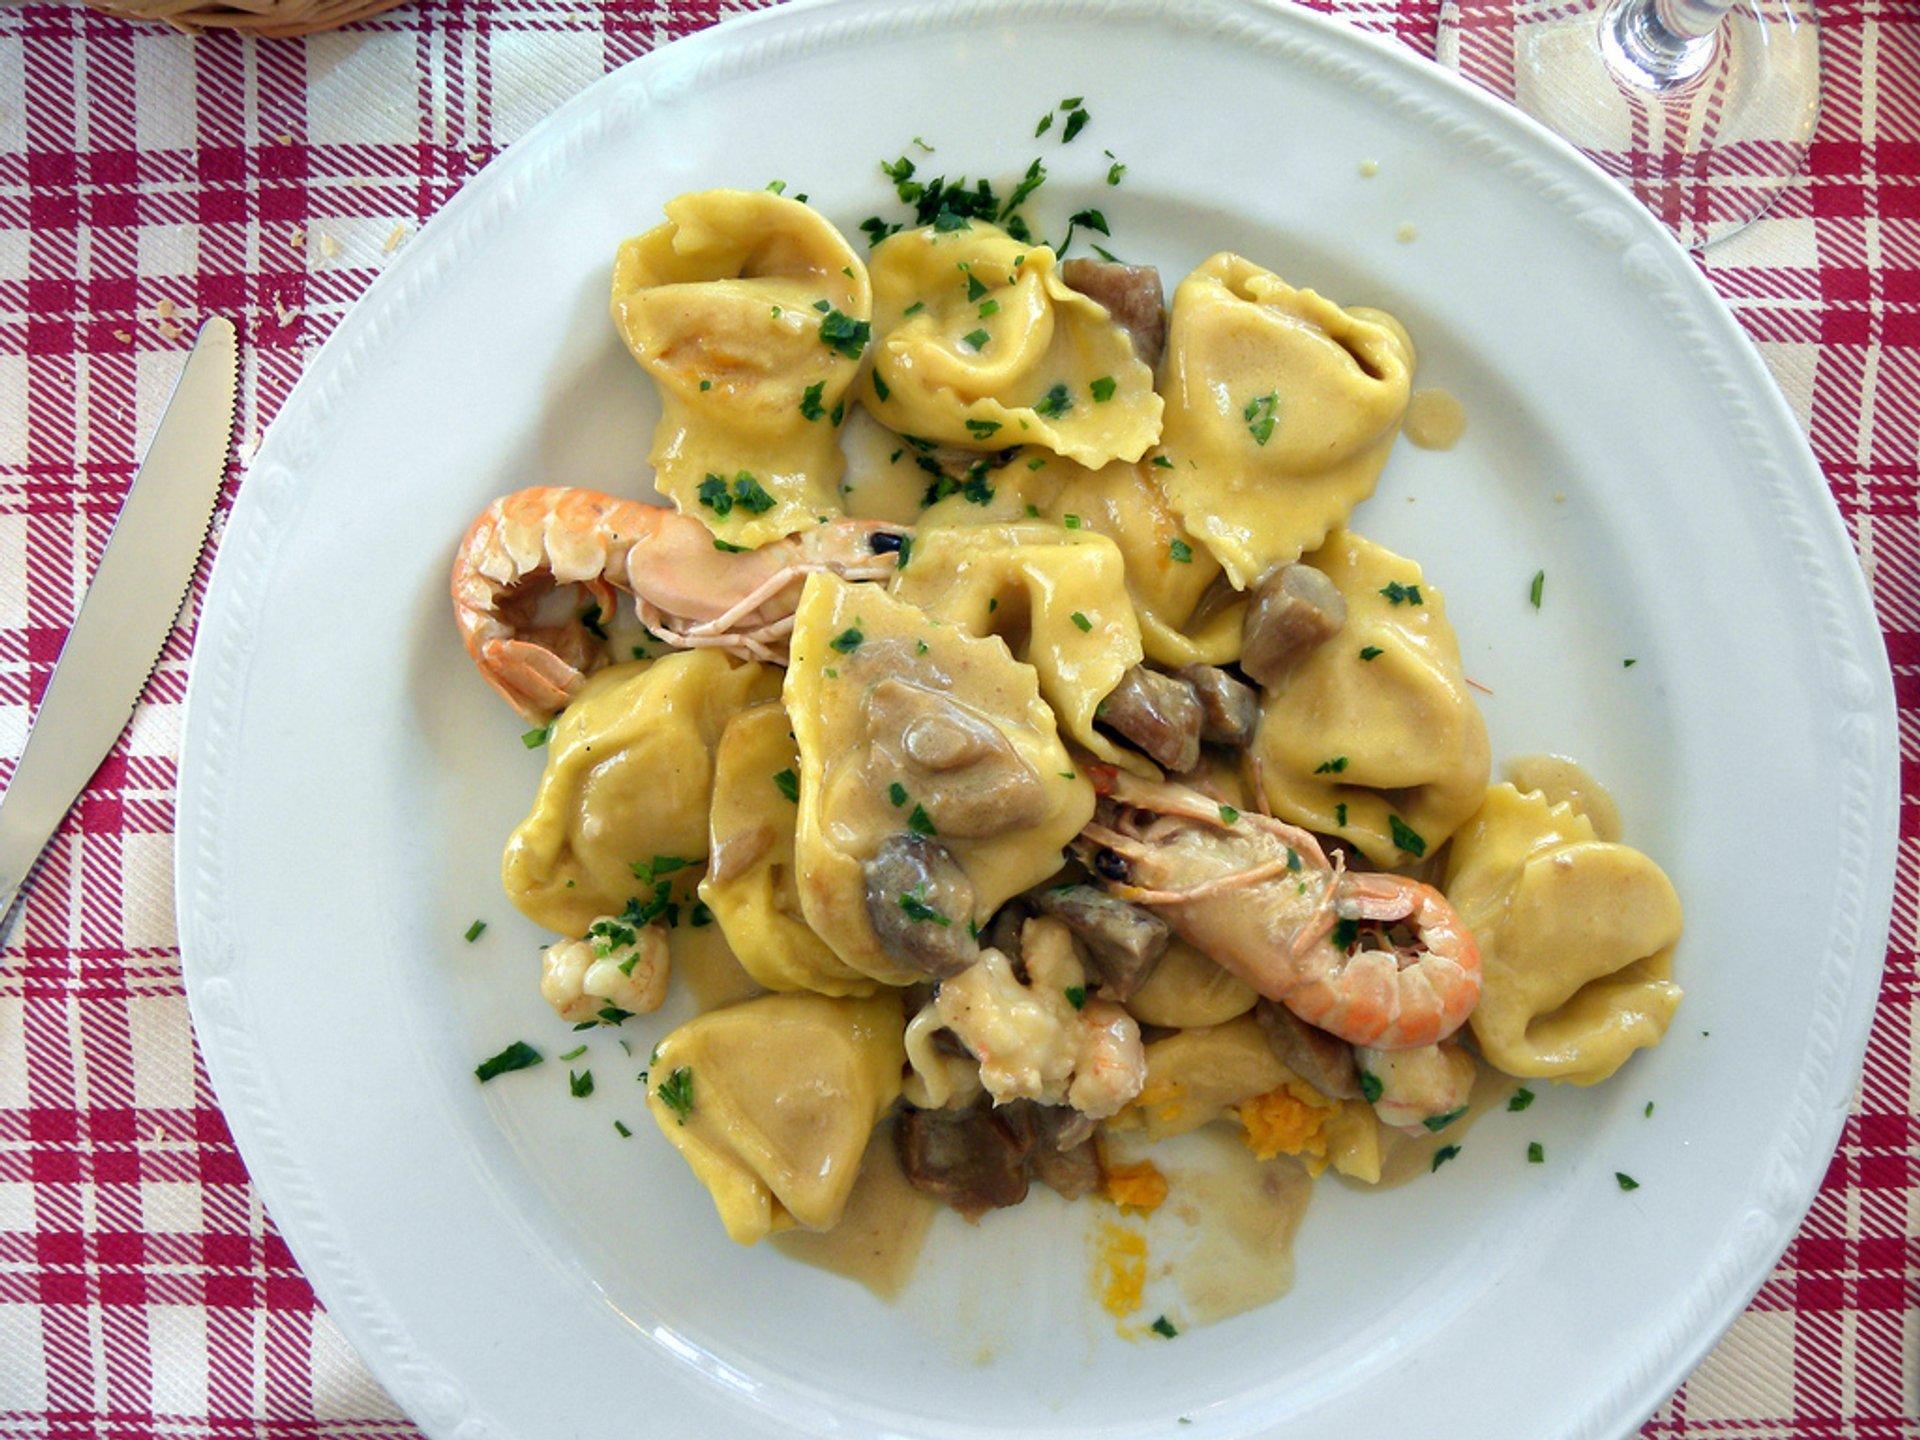 Porcini Season in Florence - Best Season